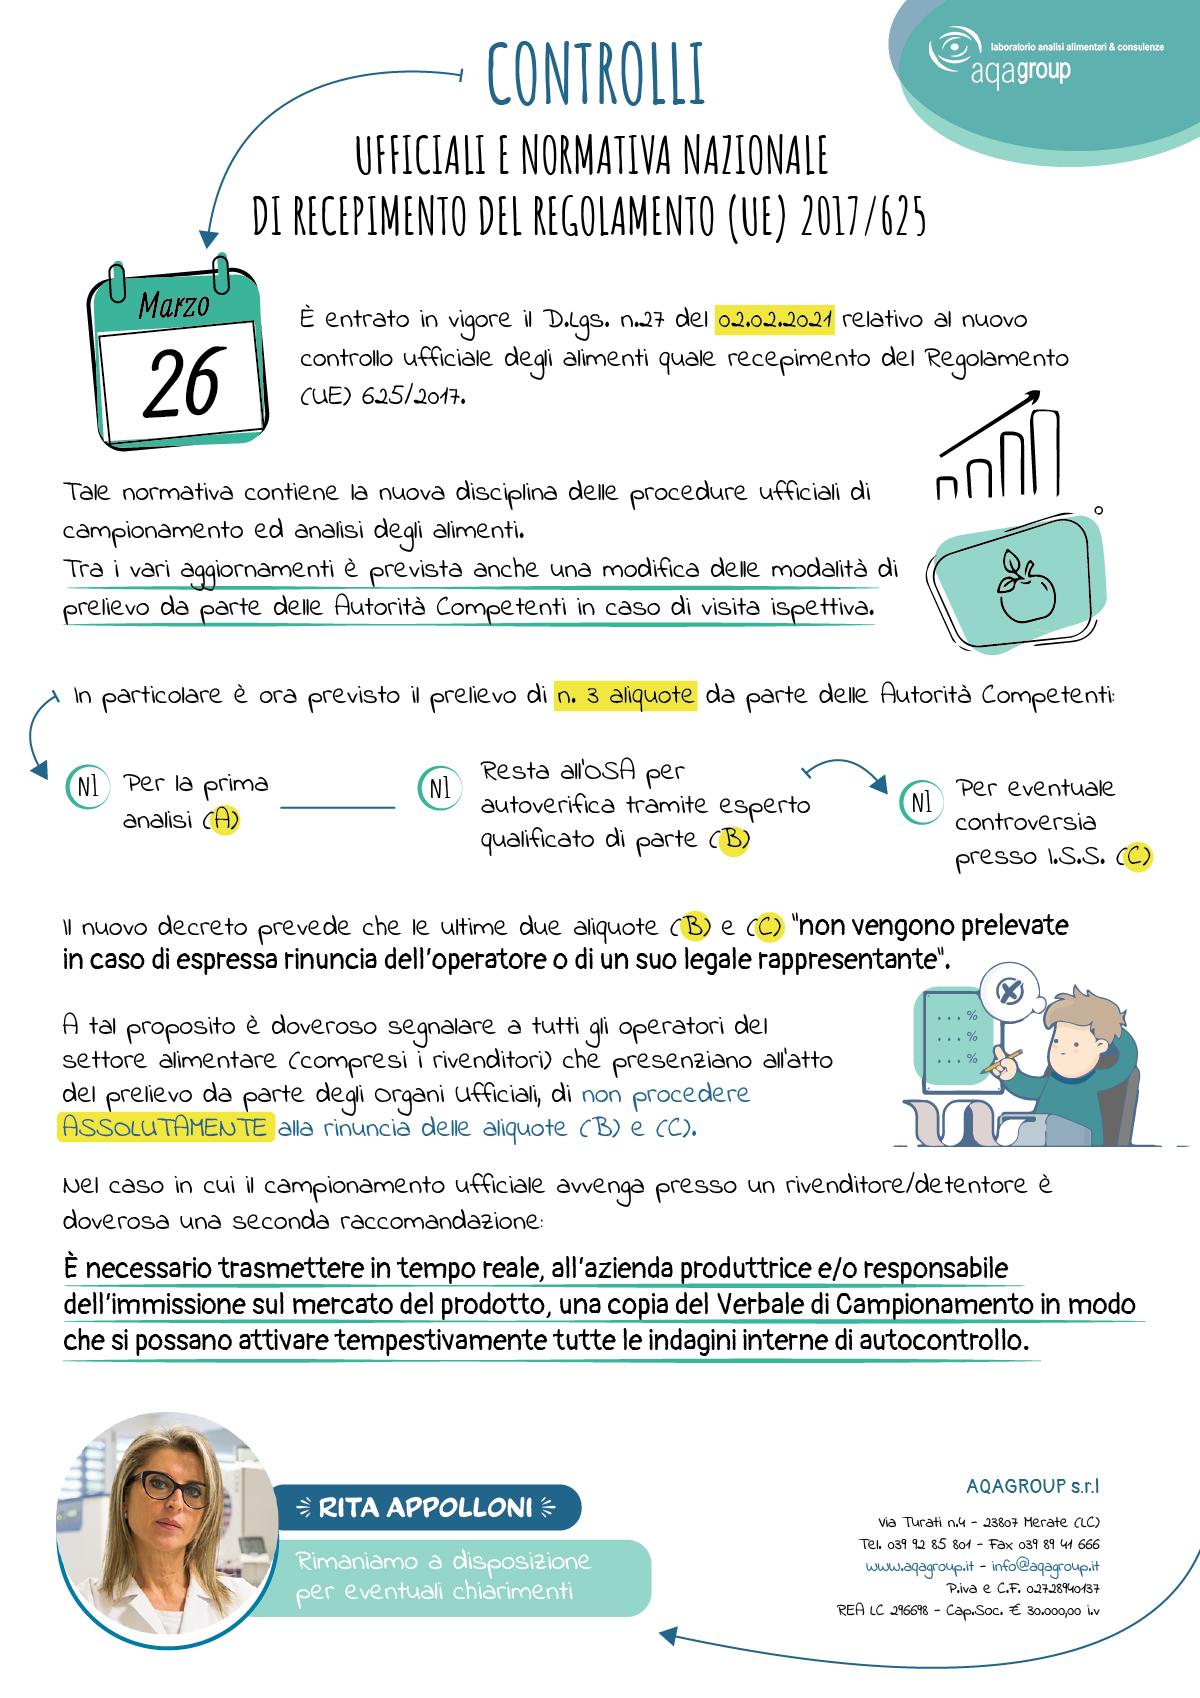 controlli-regolamento-novita-aqagroup-2017-625